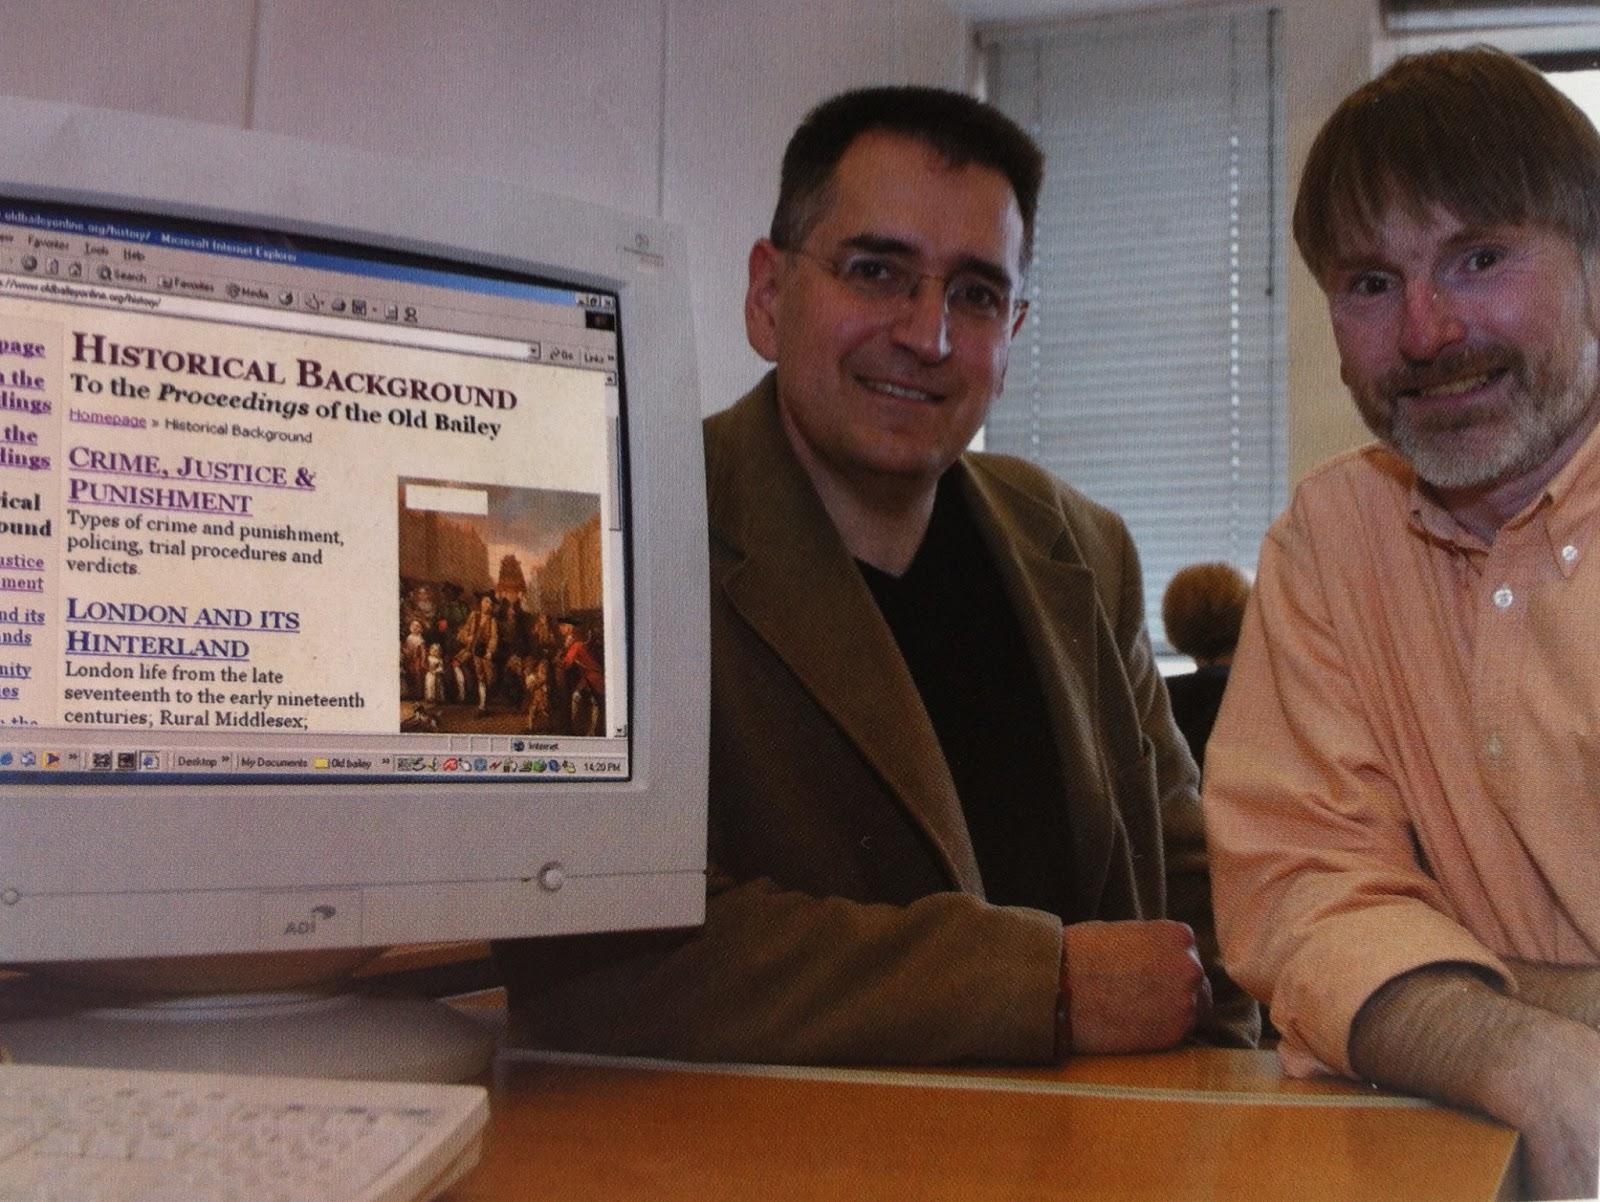 RHS Colin Matthew Memorial Lecture - Professor Tim Hitchcock and Professor Robert Shoemaker 'Making History Online'.